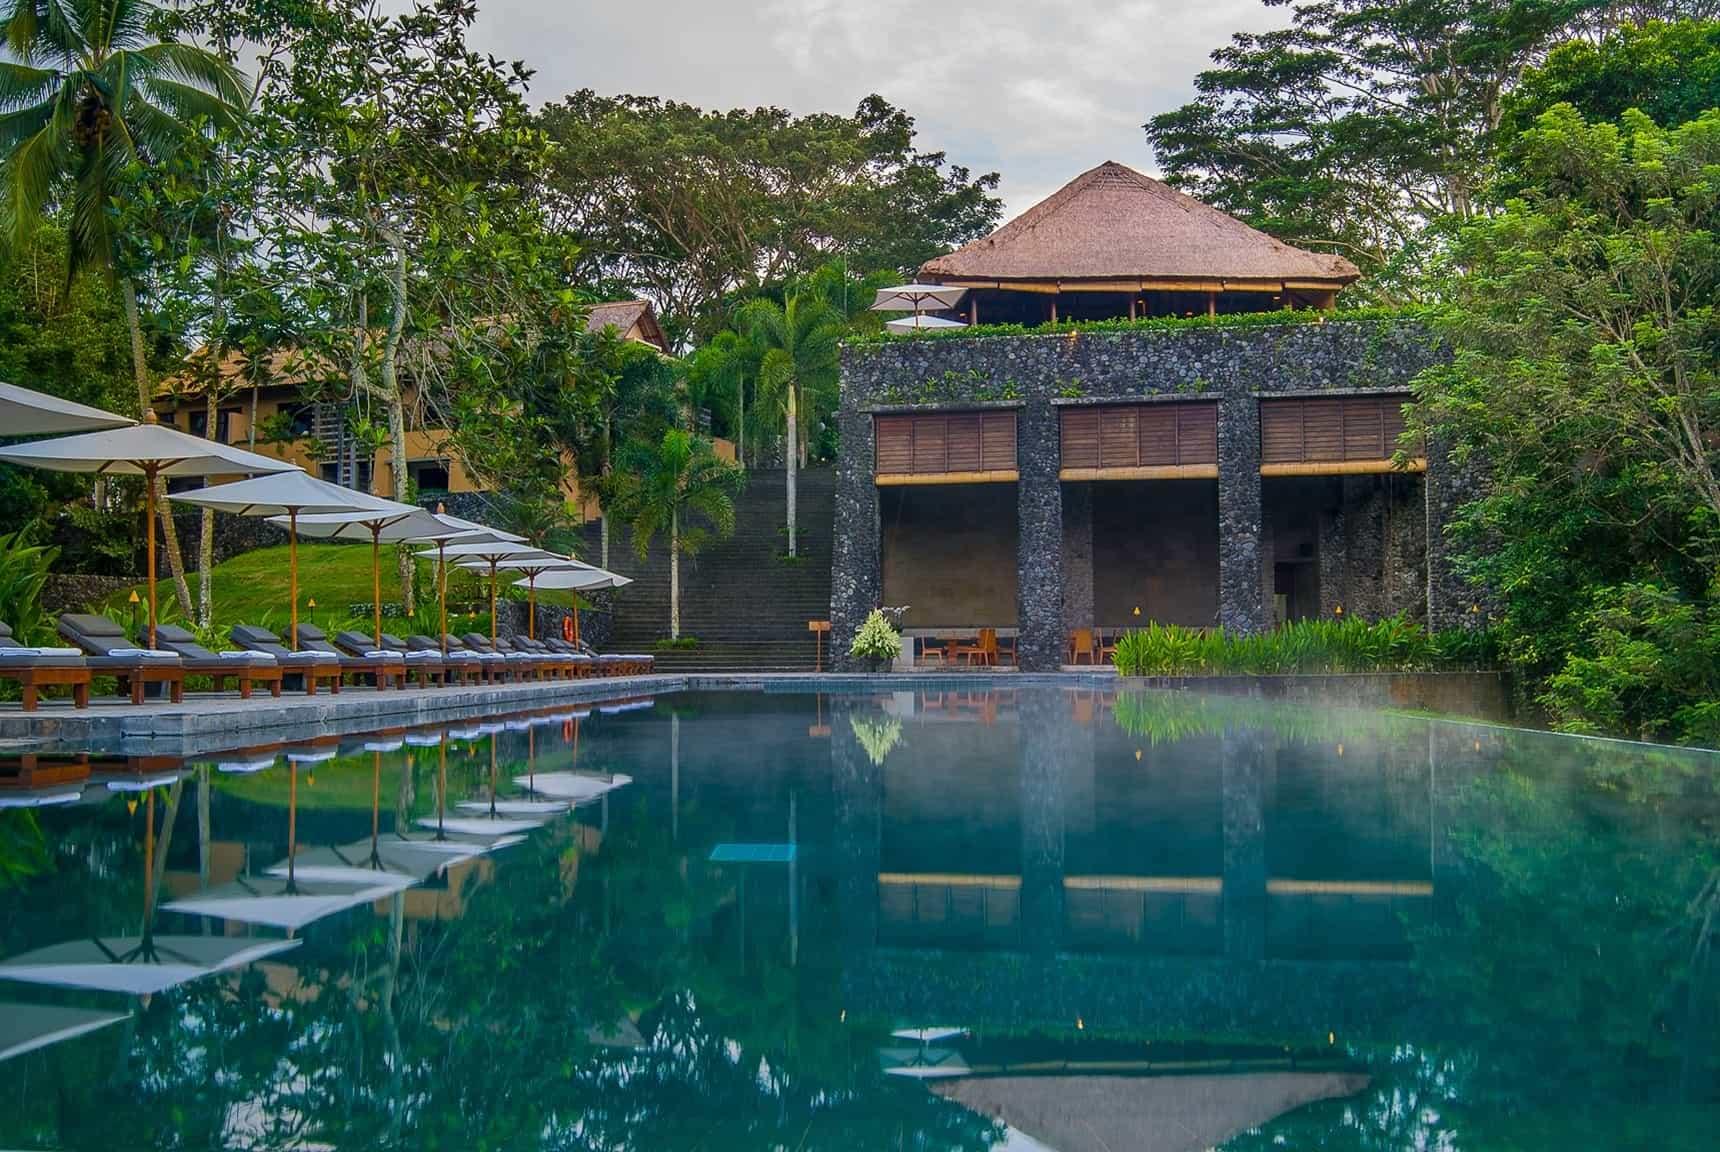 Bali Hotel Photography Alila Hotels And Resorts Ubud Bali